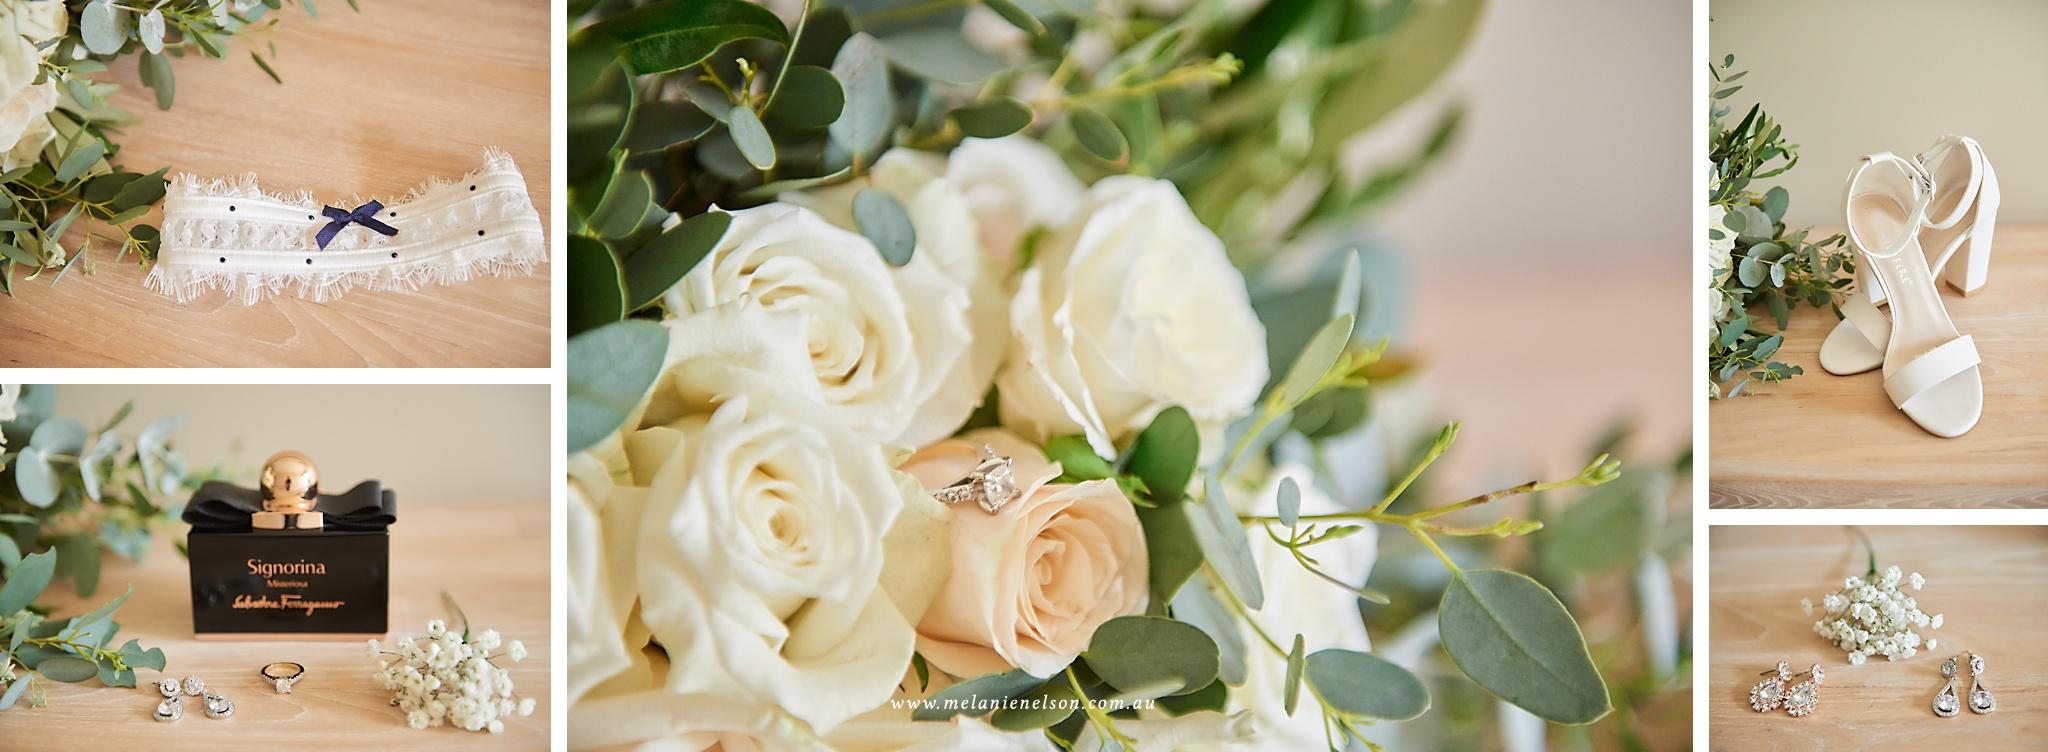 serafino_wedding_photography_0011.jpg